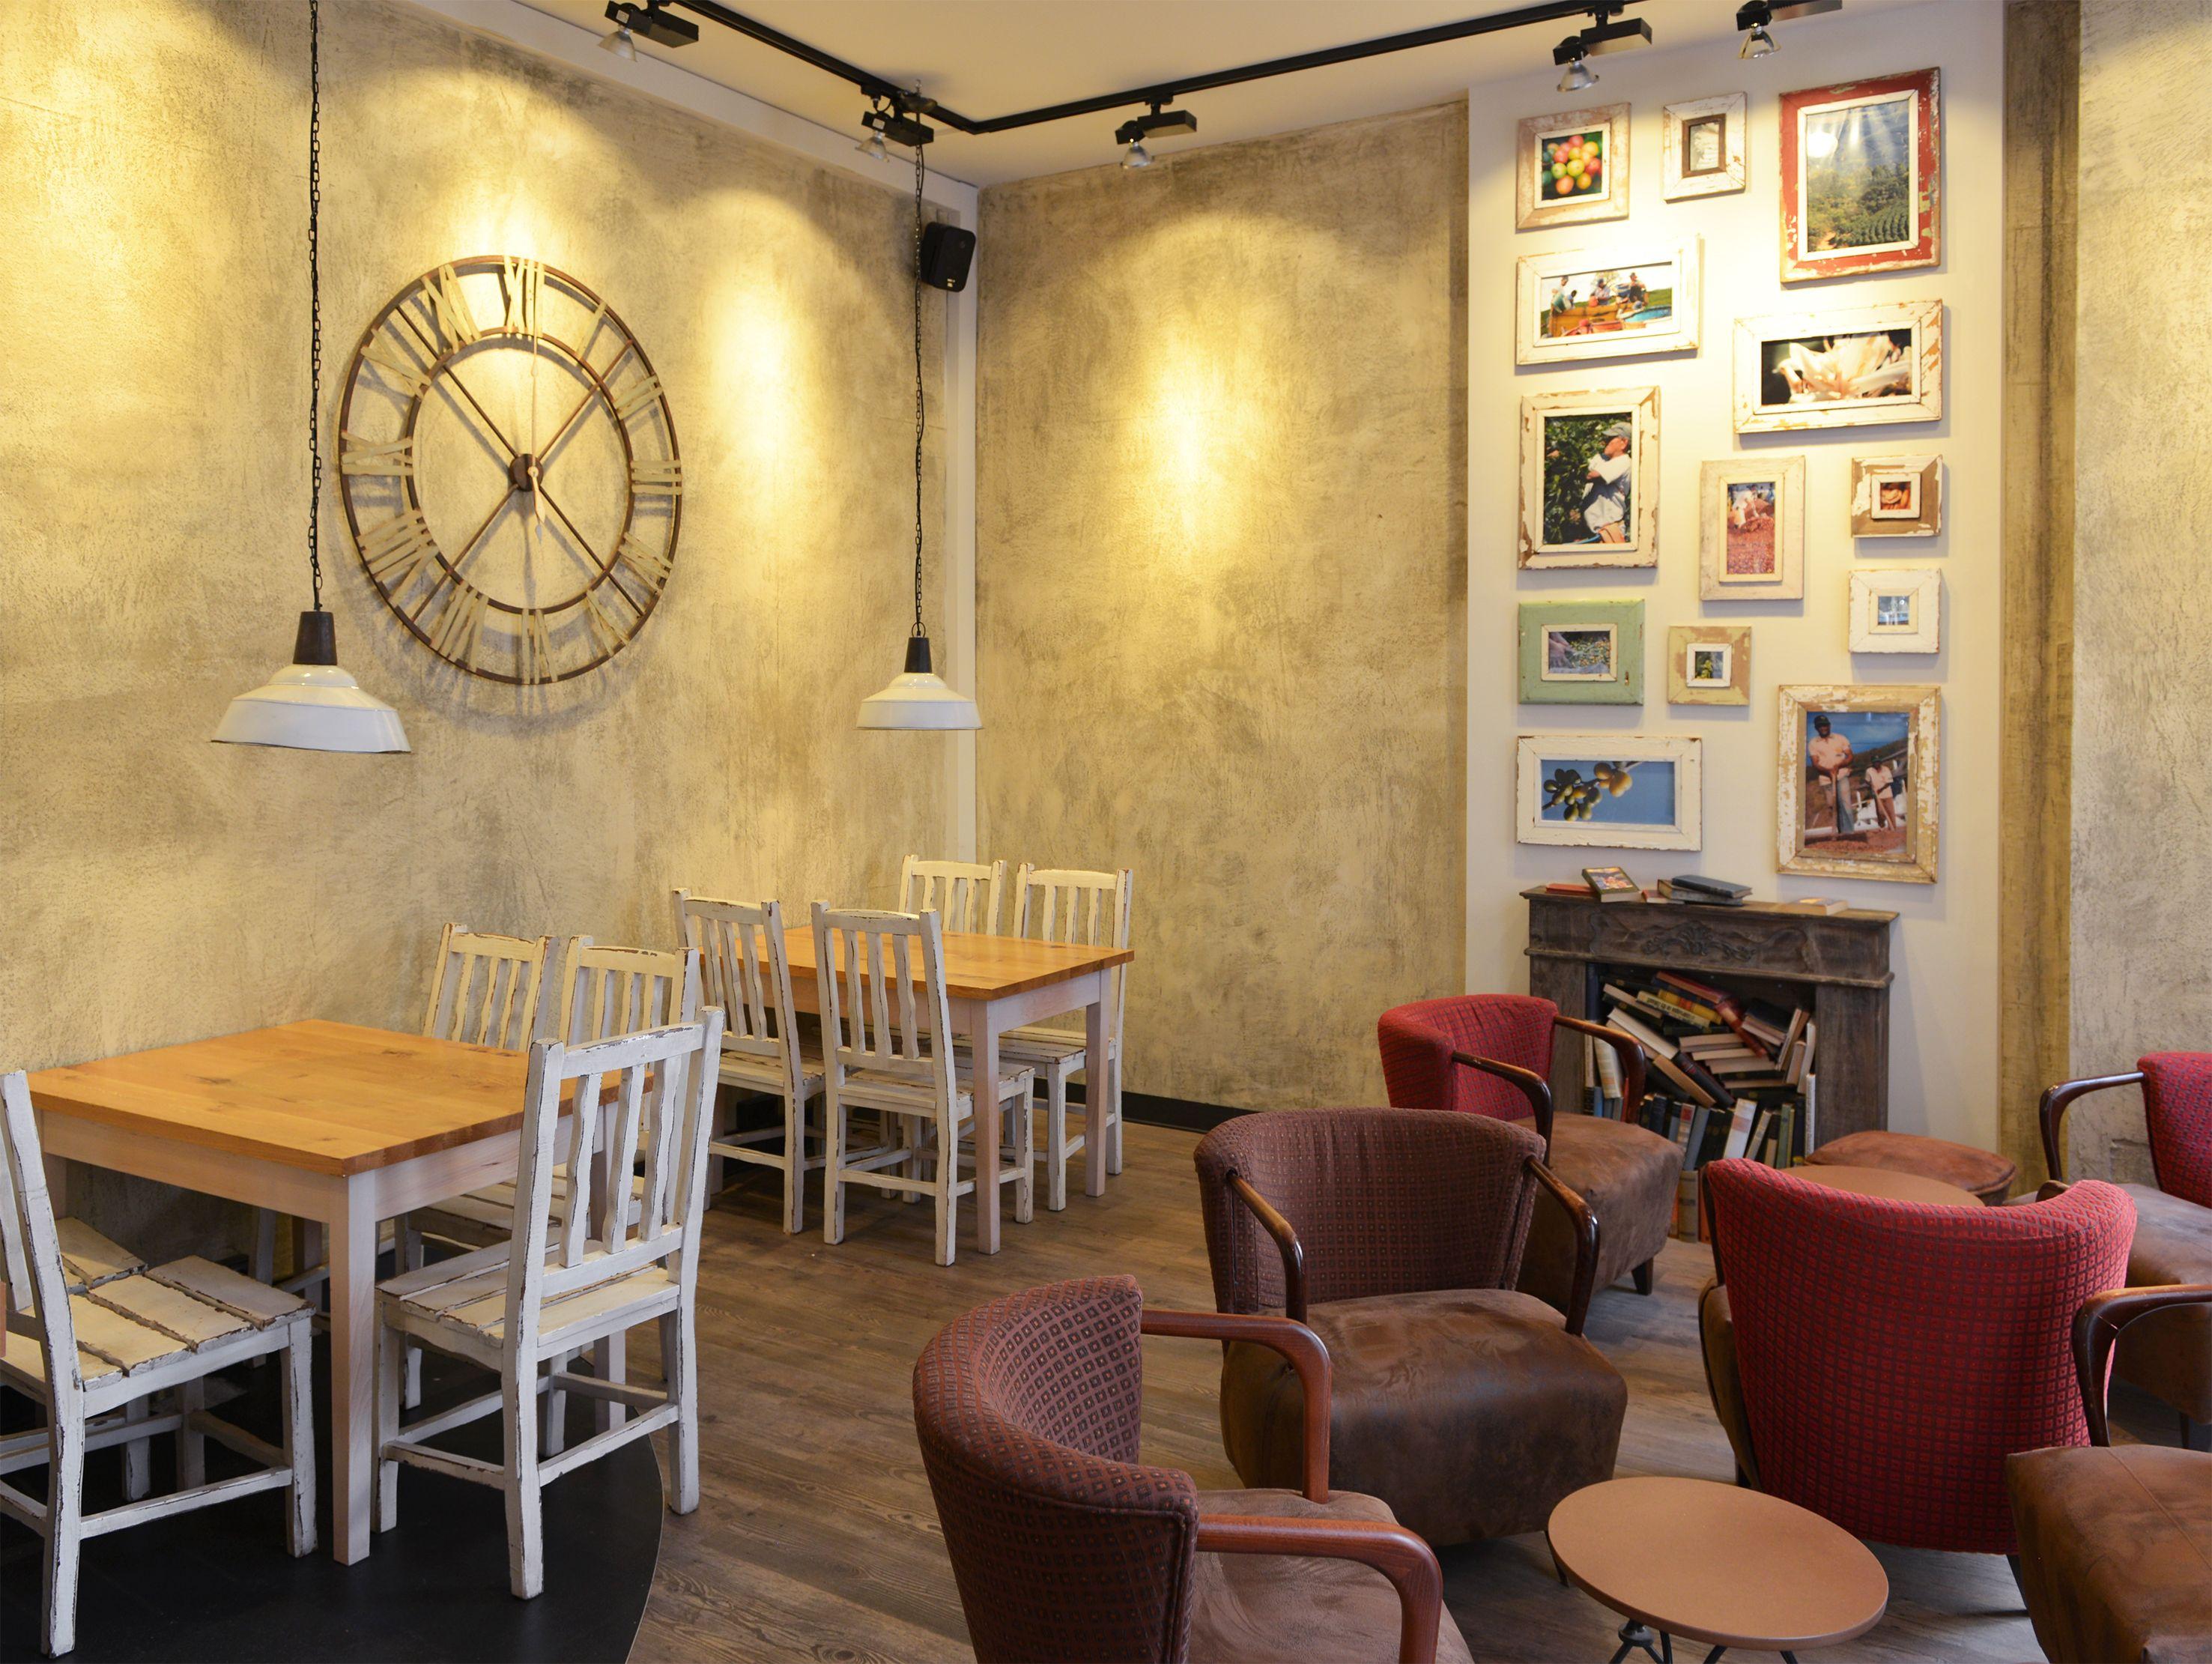 Inspiration Restaurant Steglitz Berlin Design-ideen - Garten-Design ...